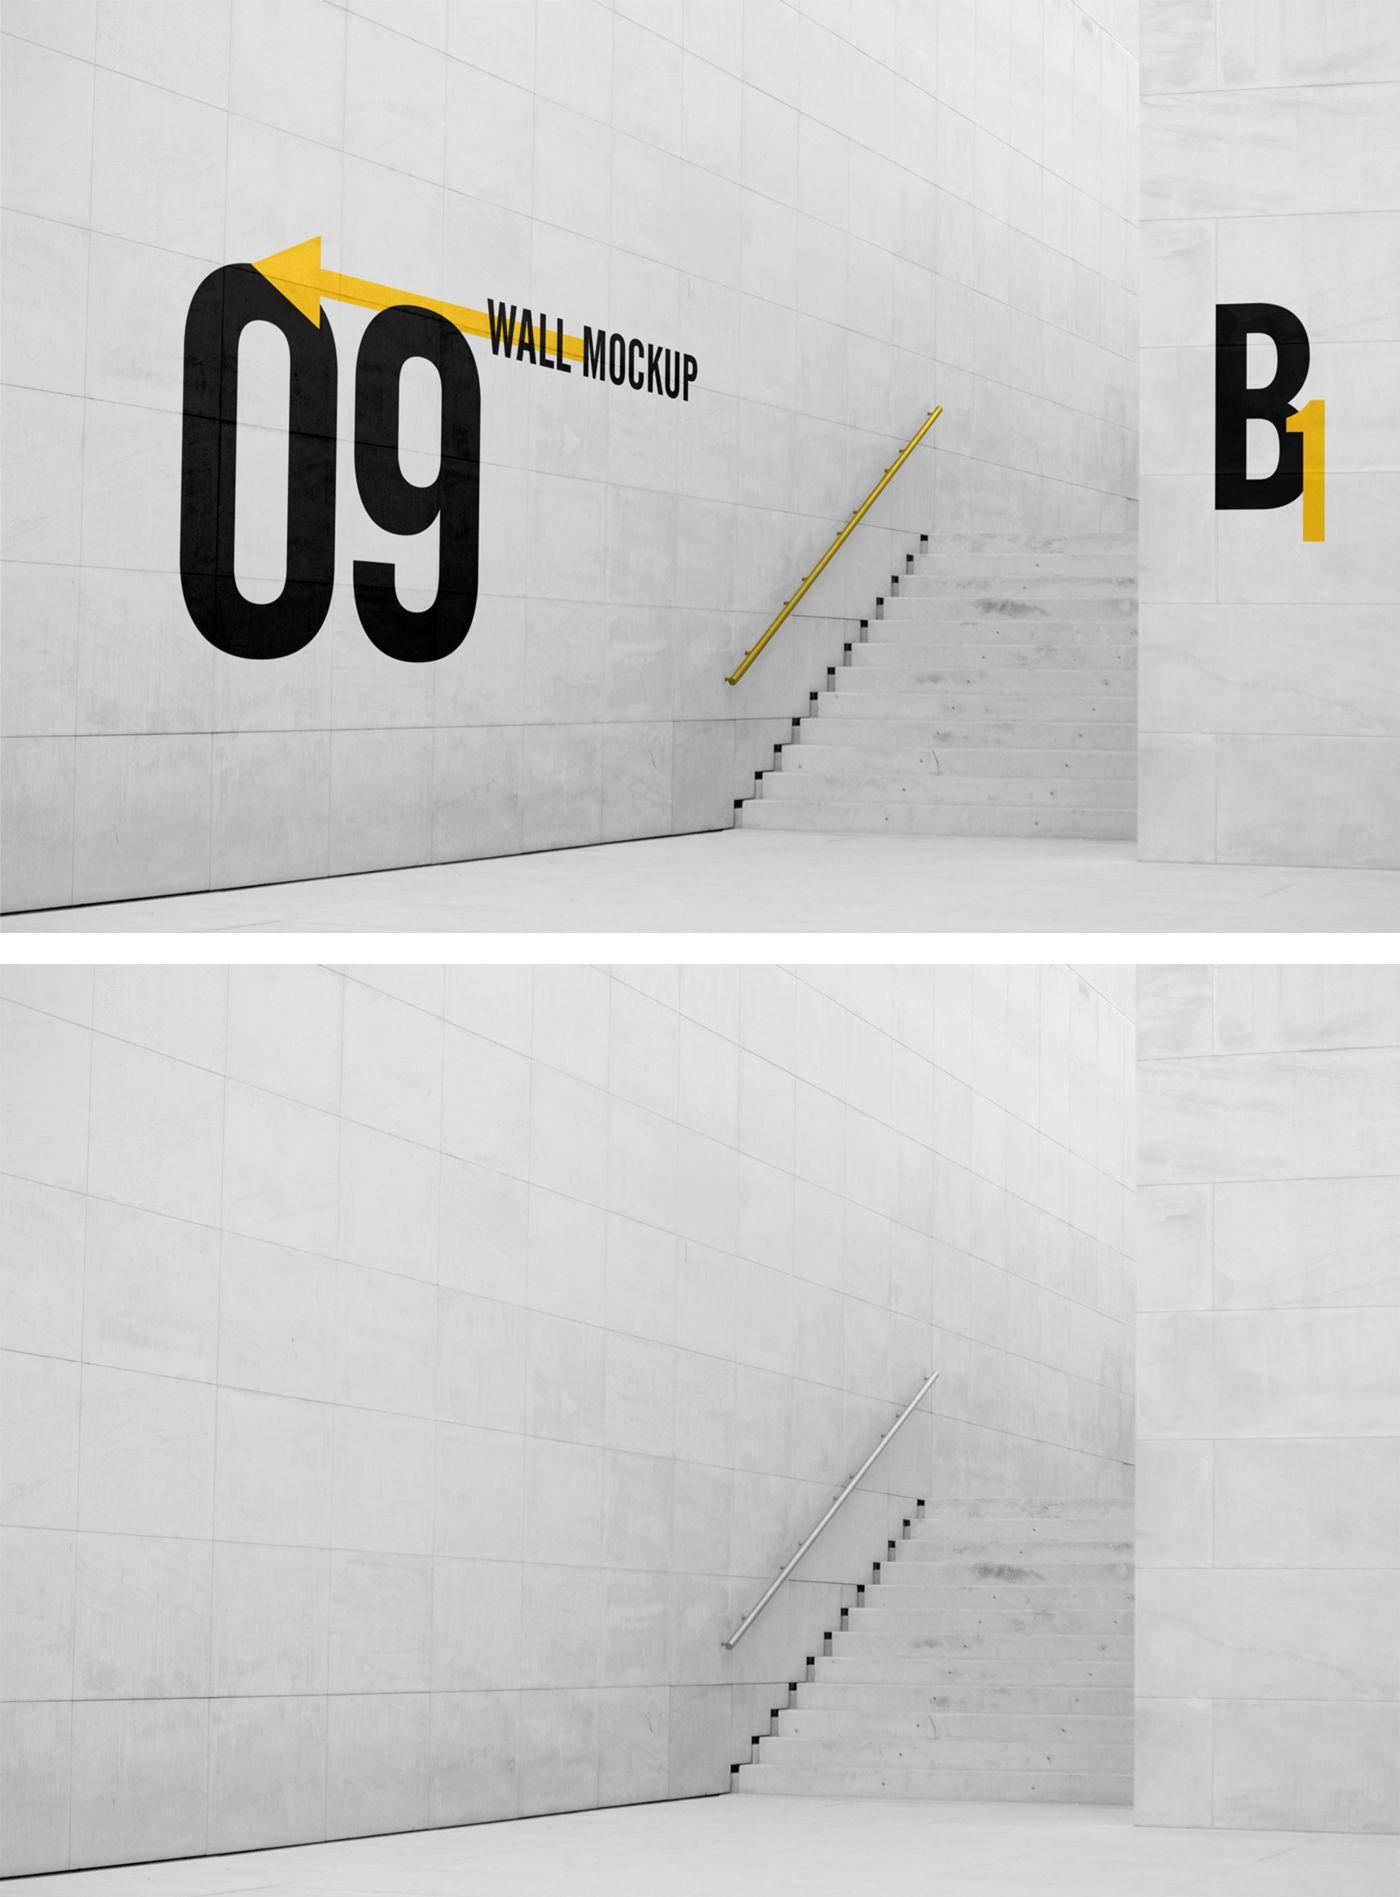 Big Wall Mockup Signage Design Wall Signs Sign Design